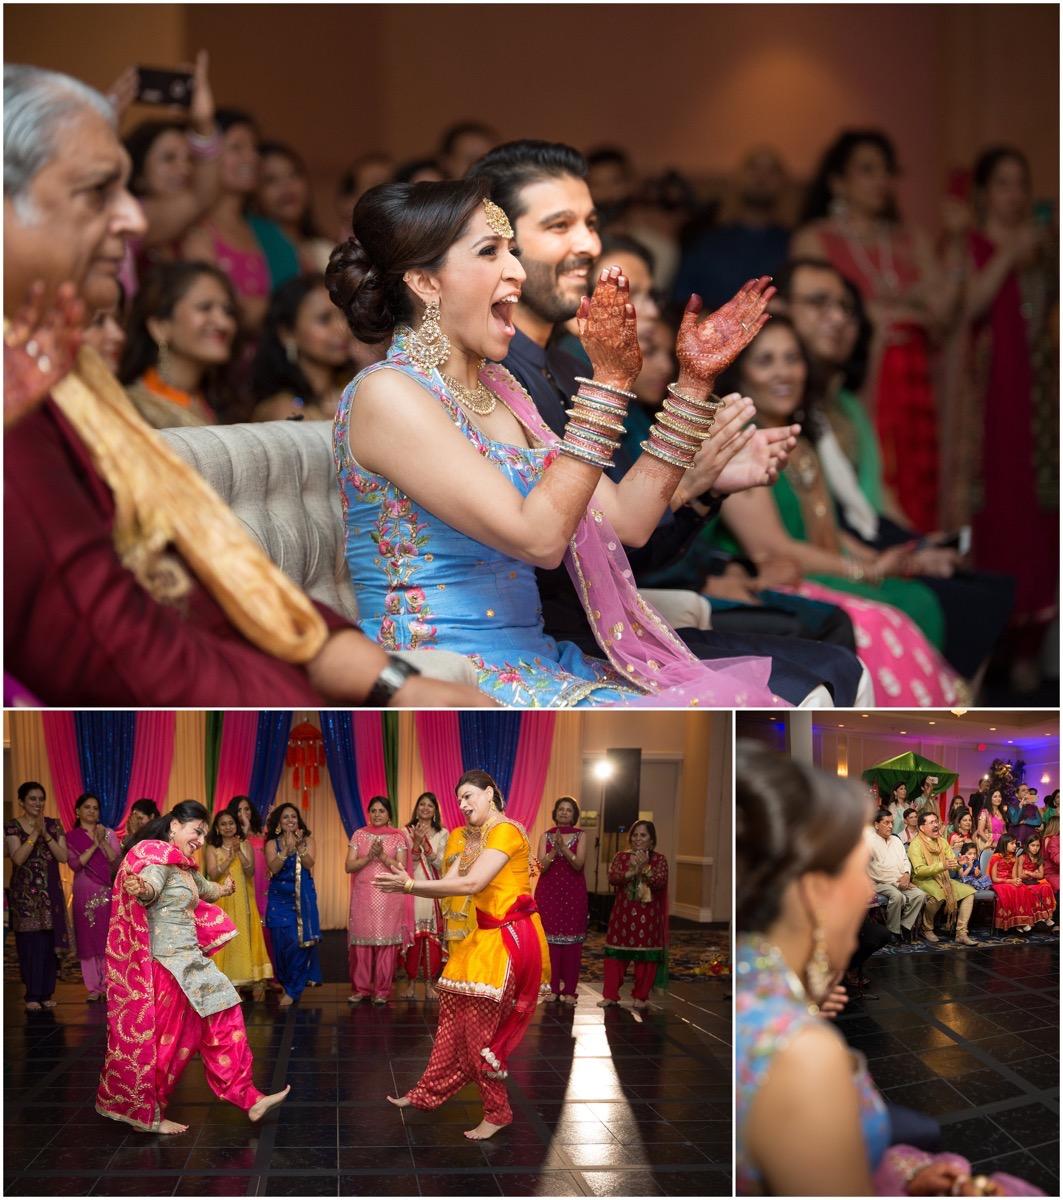 Le Cape Weddings - South Asian Wedding in Illinois - Tanvi and Anshul -4104_LuxuryDestinationPhotographer.jpg